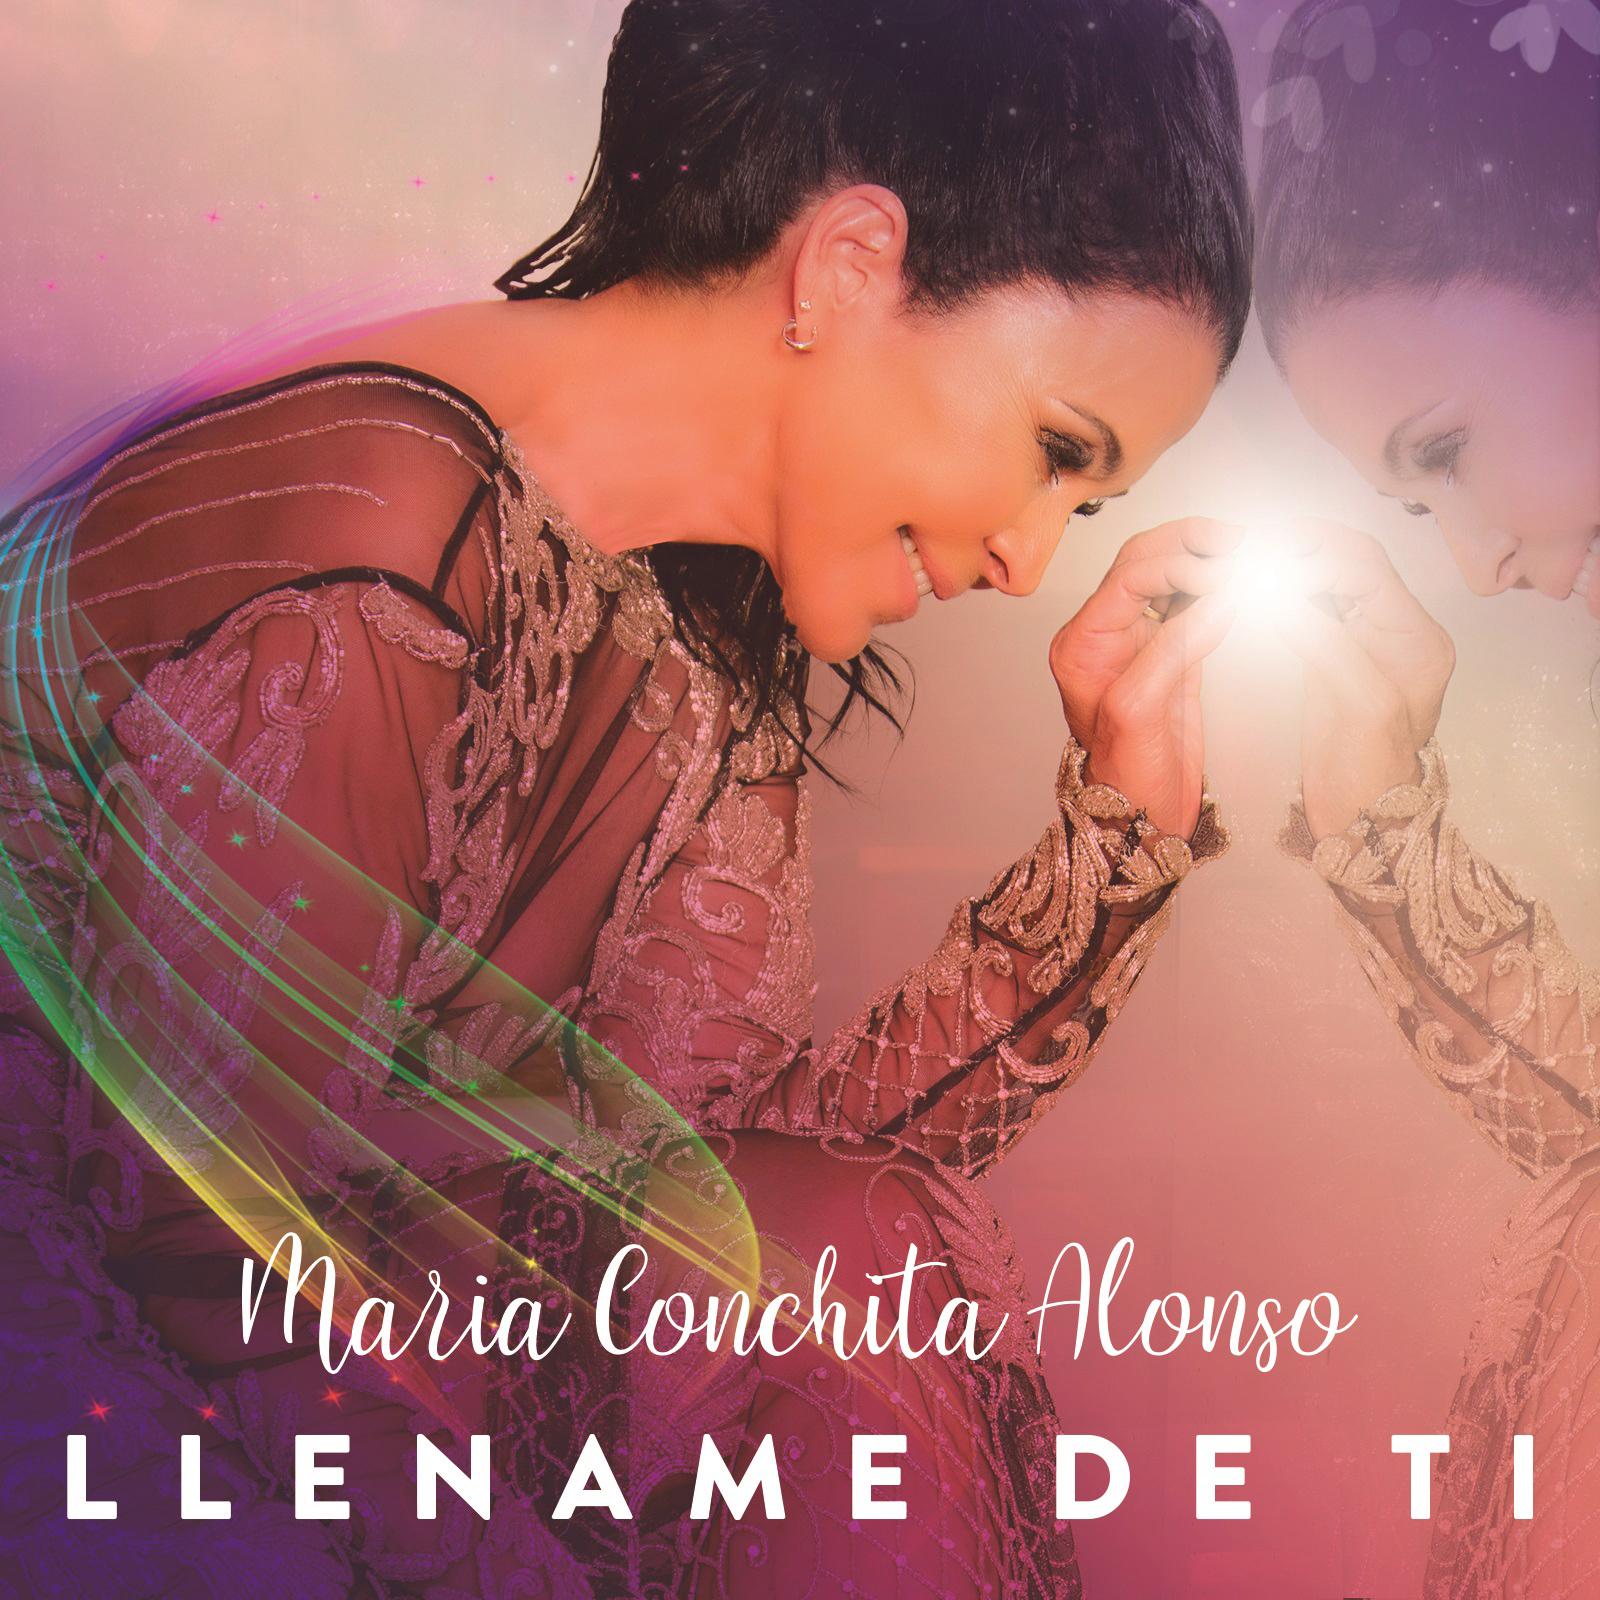 Maria Conchita Alonso - Hot List - August 2020